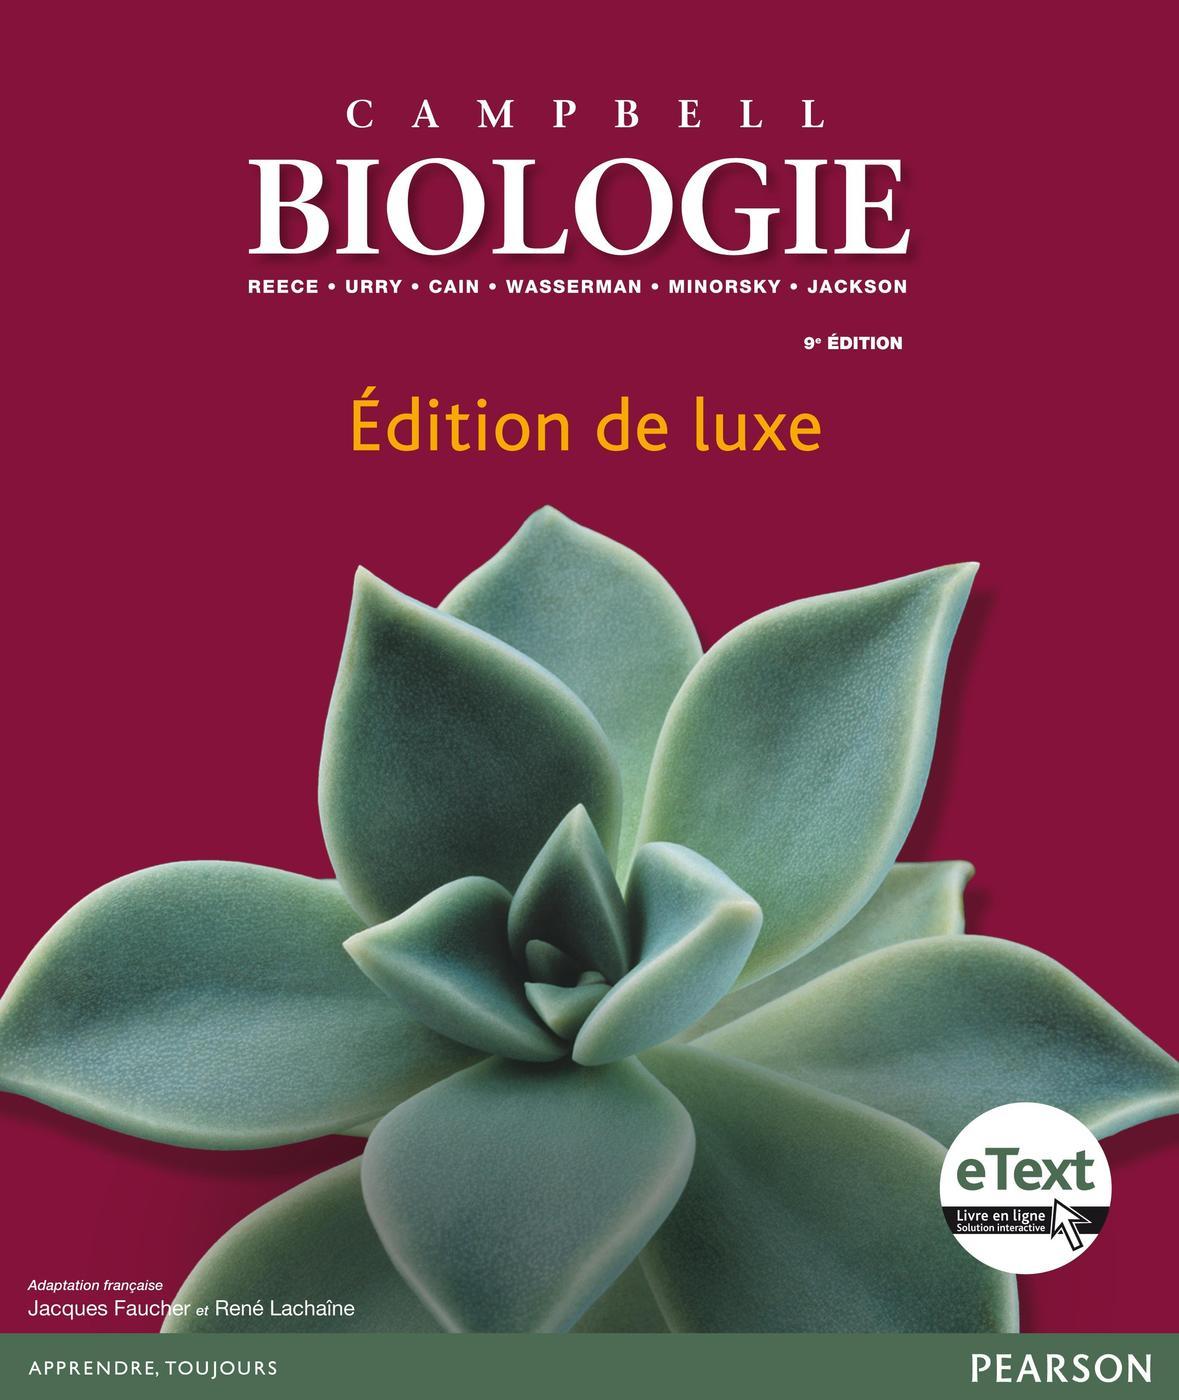 Biologie Edition De Luxe Avec E Text N Campbell 9eme Edition Librairie Eyrolles